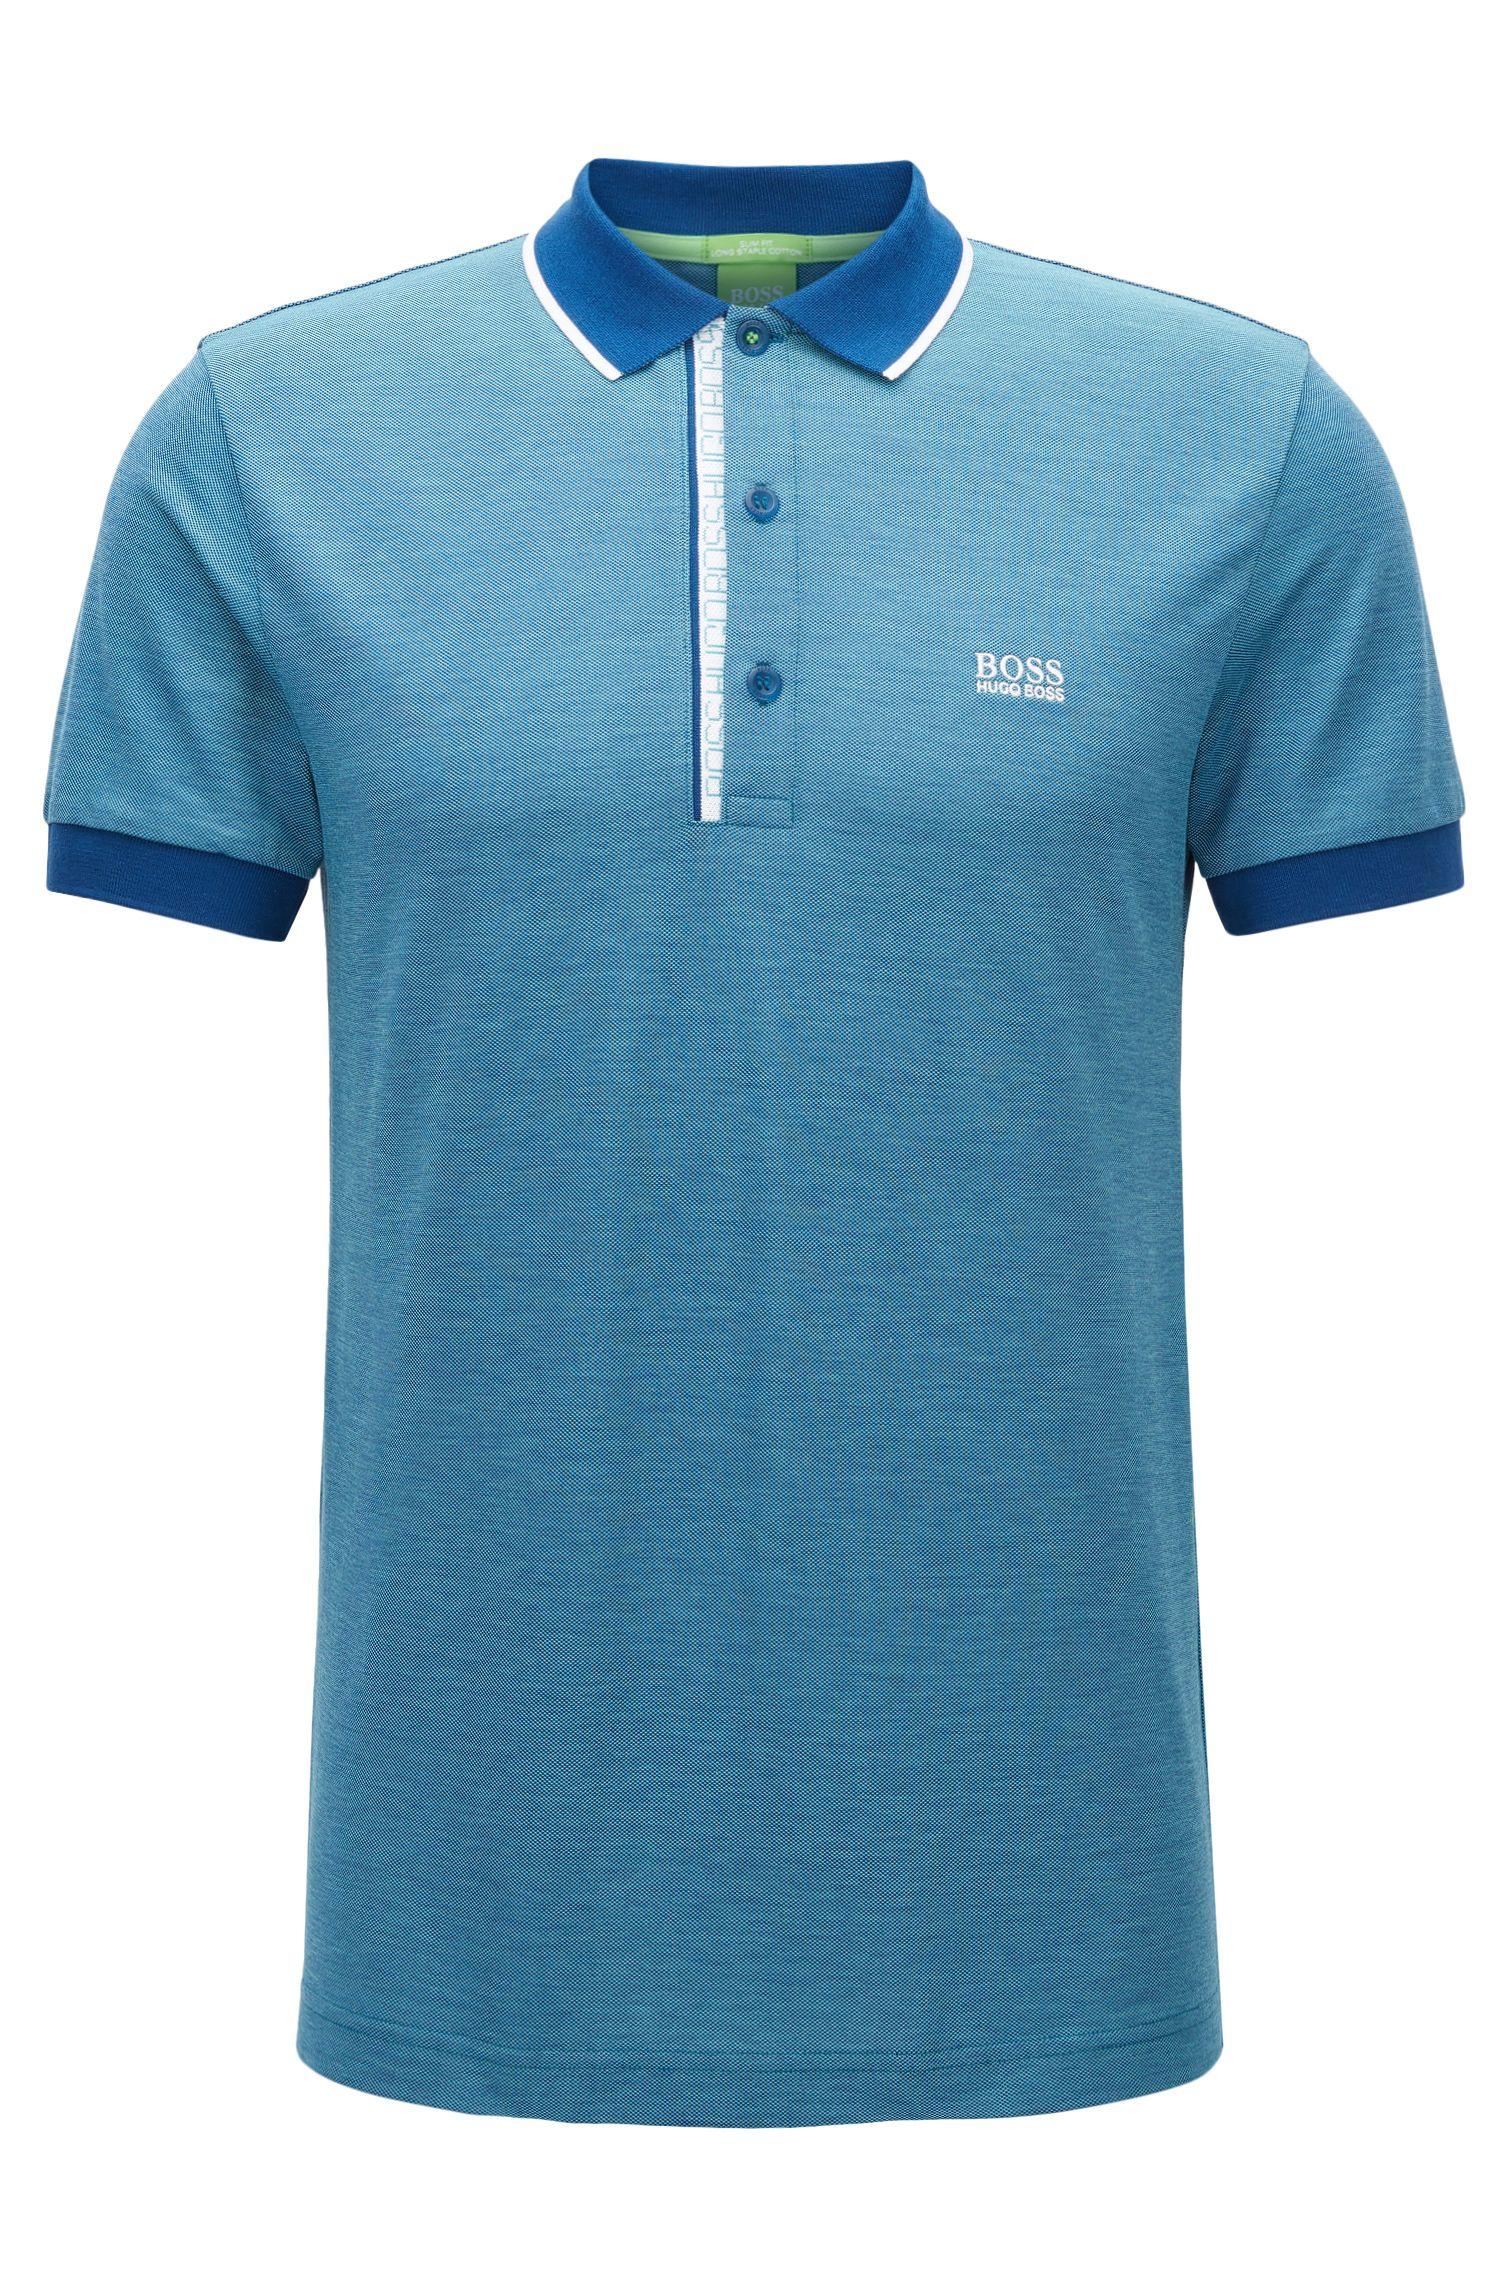 Oxfotd Cotton Polo Shirt, Slim Fit | Paule